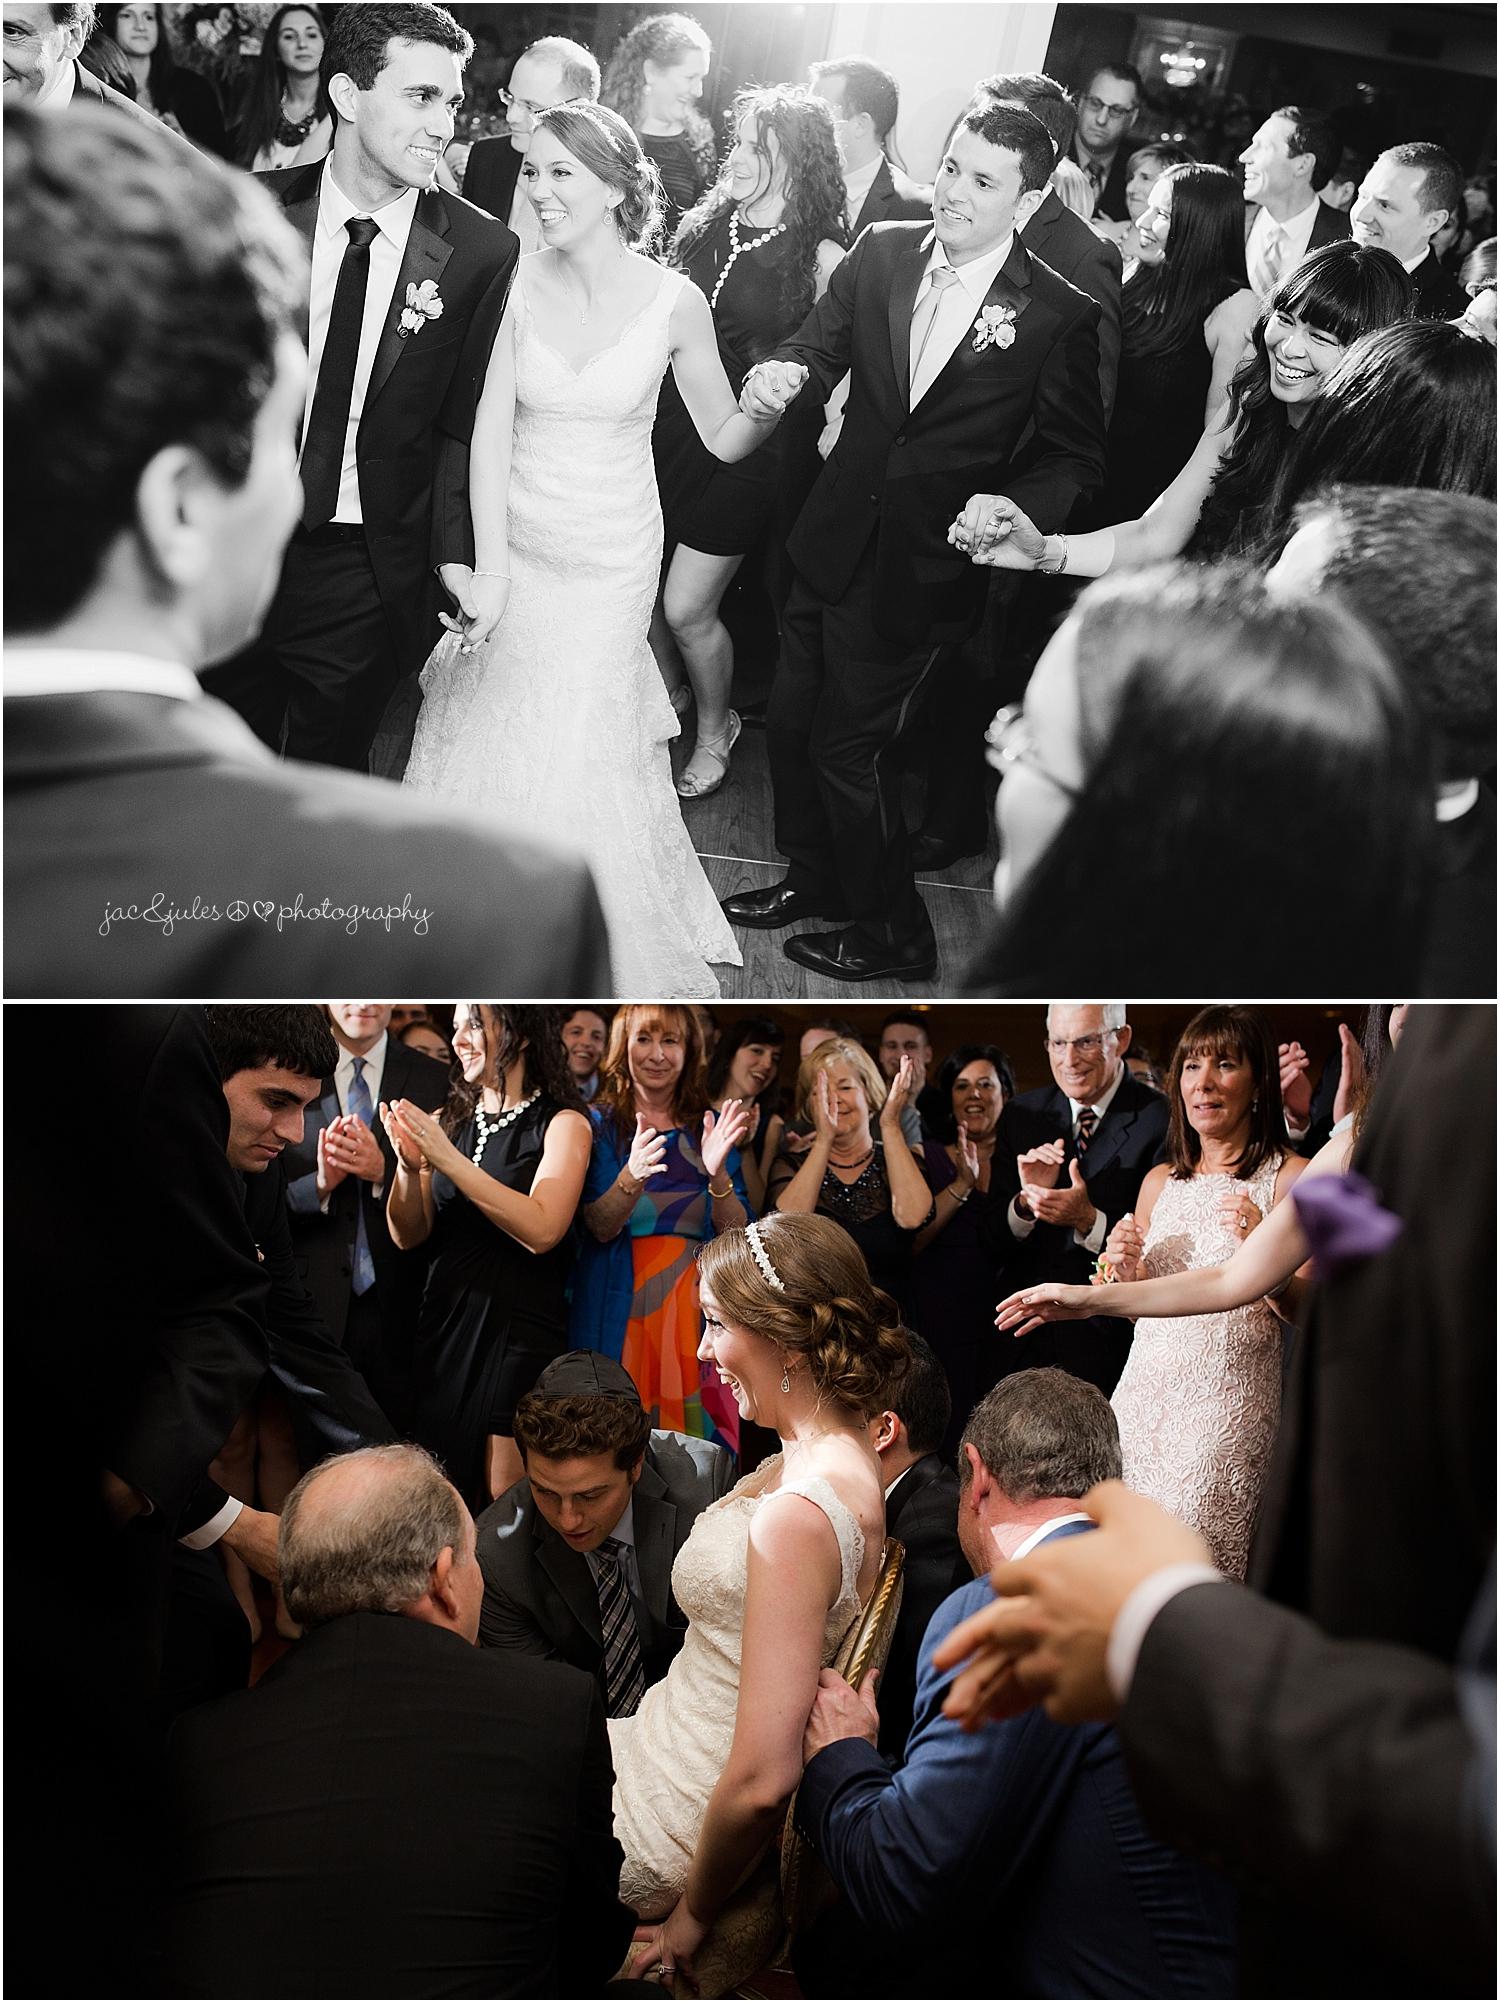 jacnjules photograph a jewish wedding at the olde mill inn reception ballroom